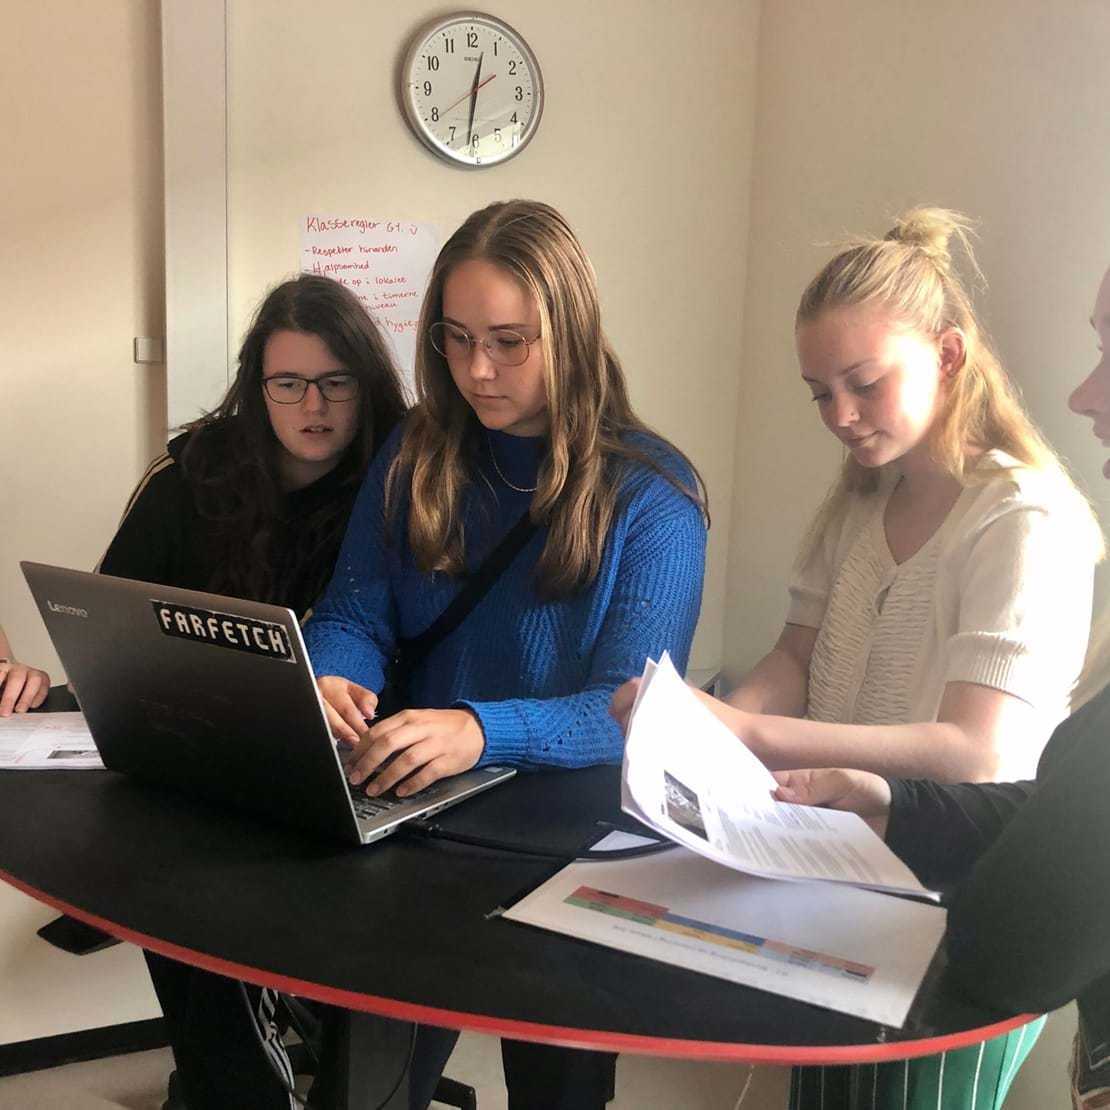 Fem piger står samlet om én computer